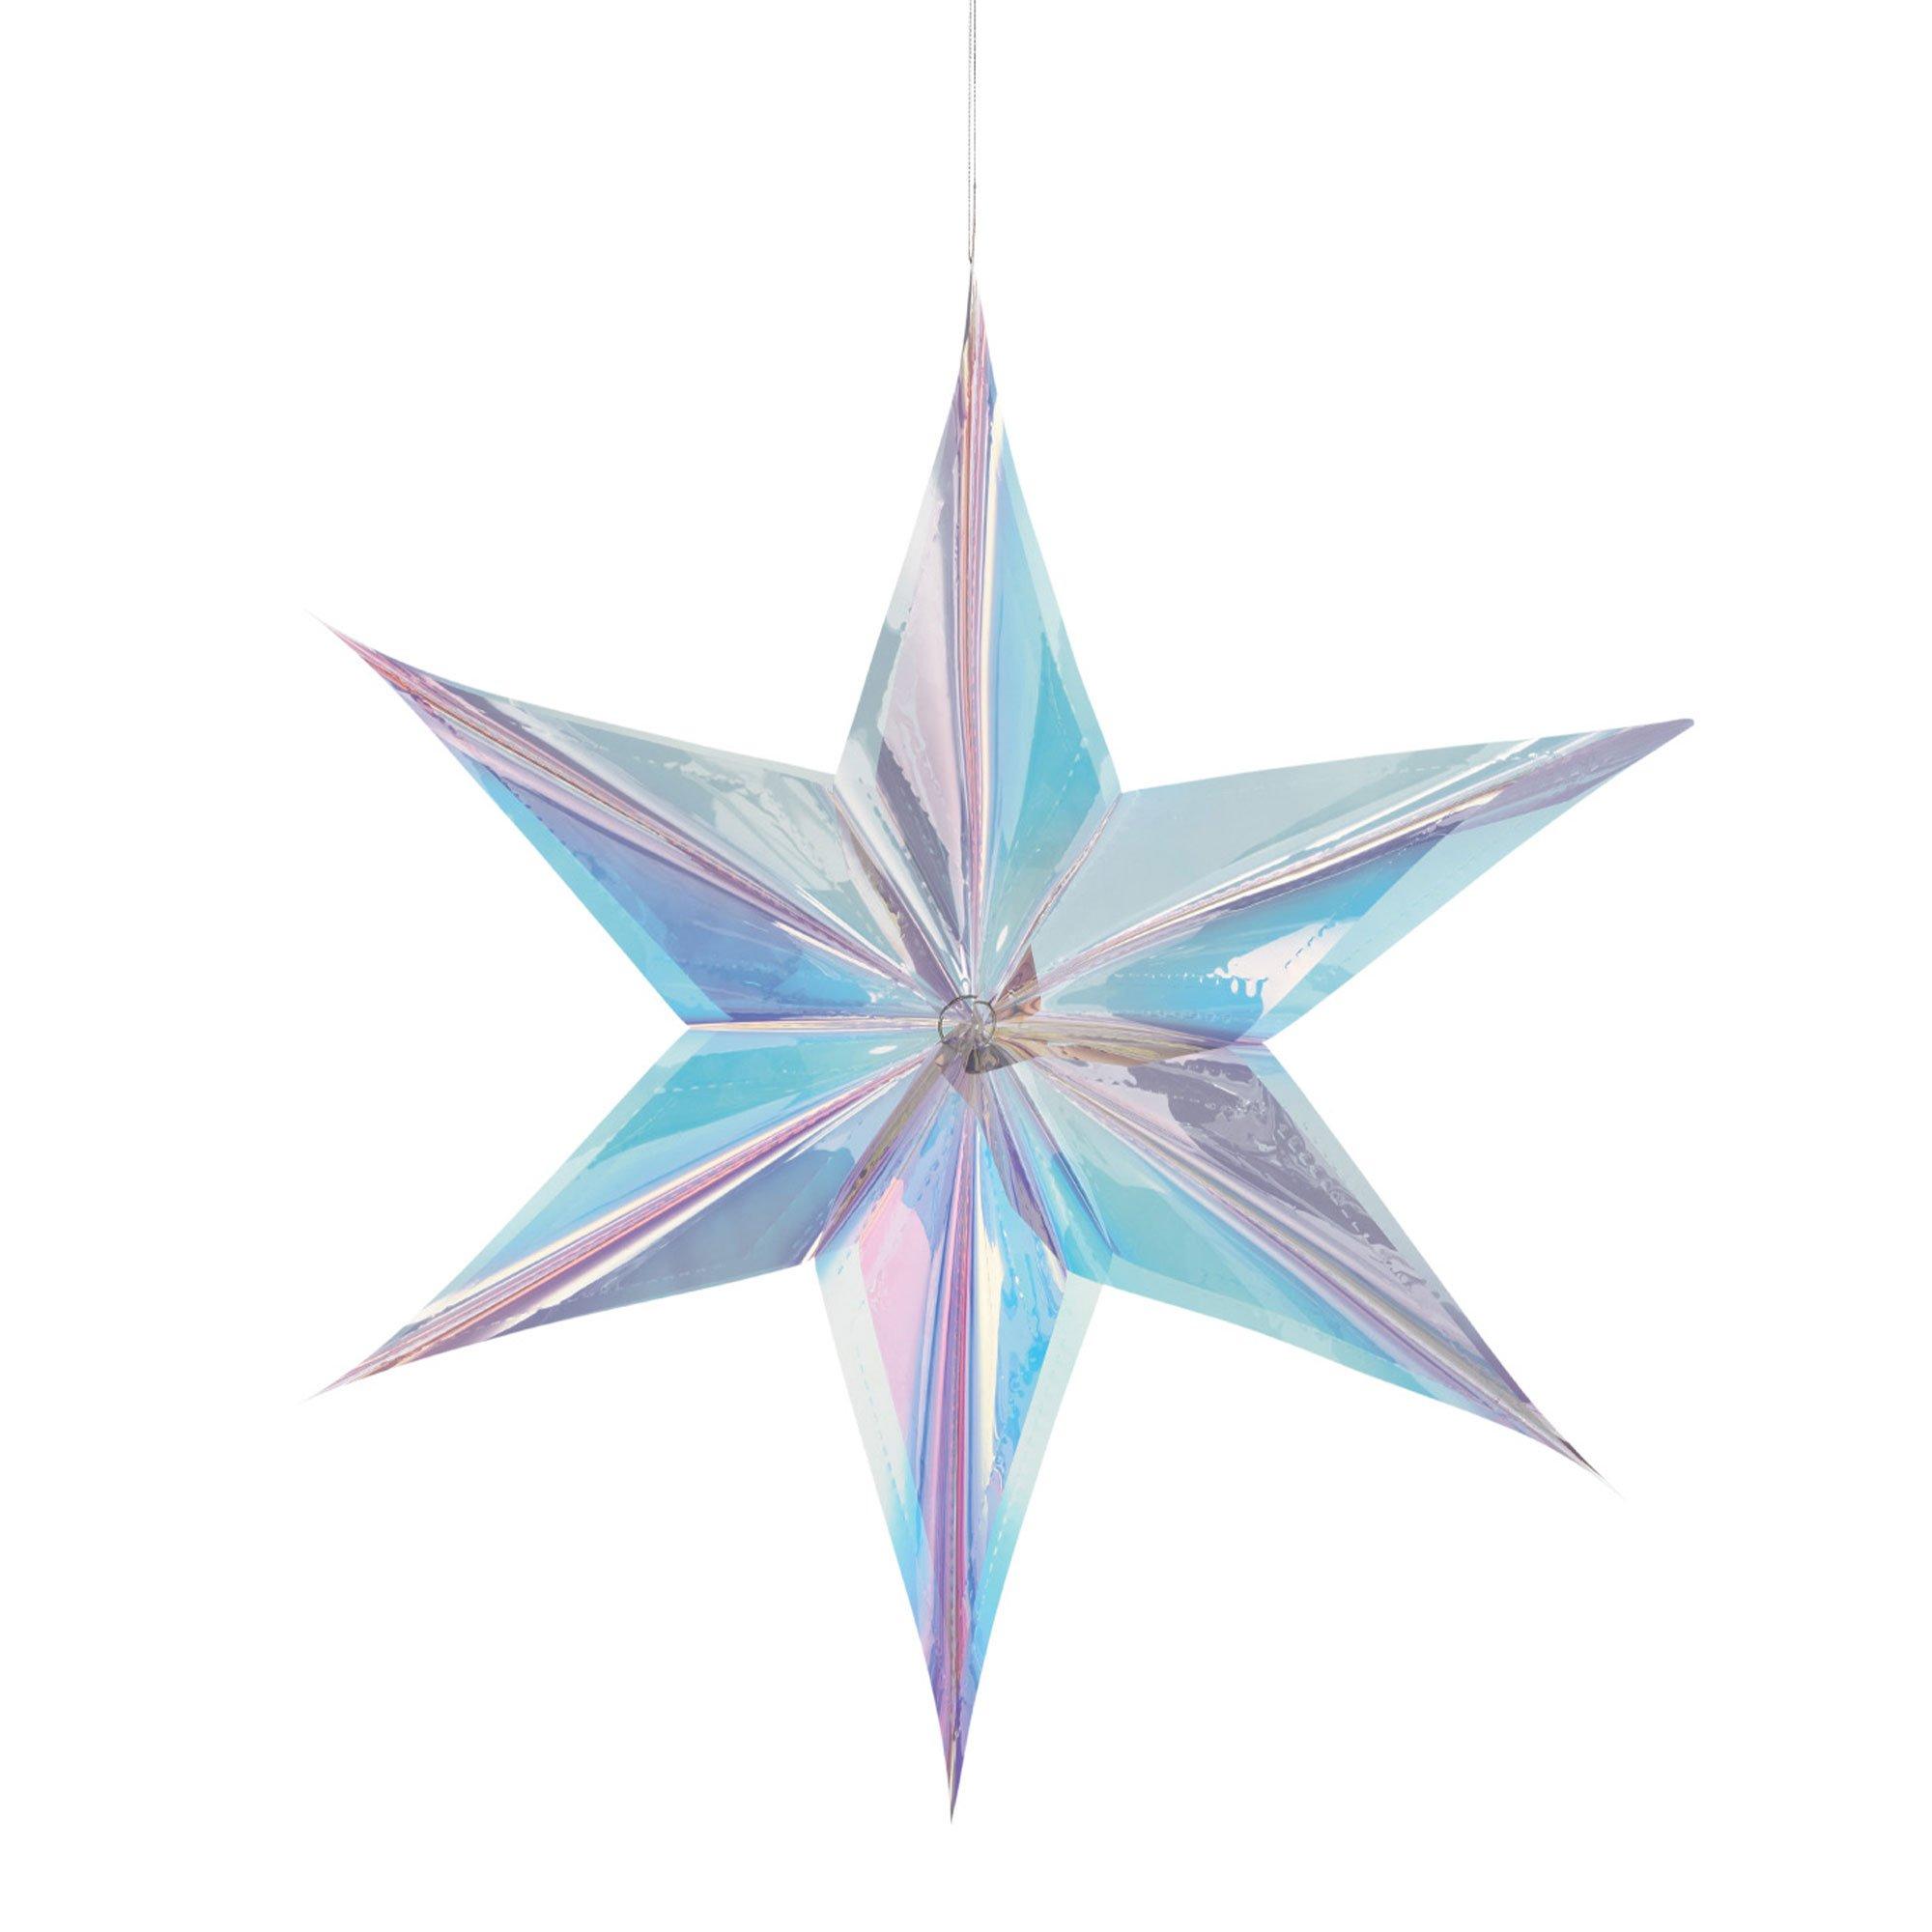 Luminous Birthday Iridescent Foil Star Hanging Decoration